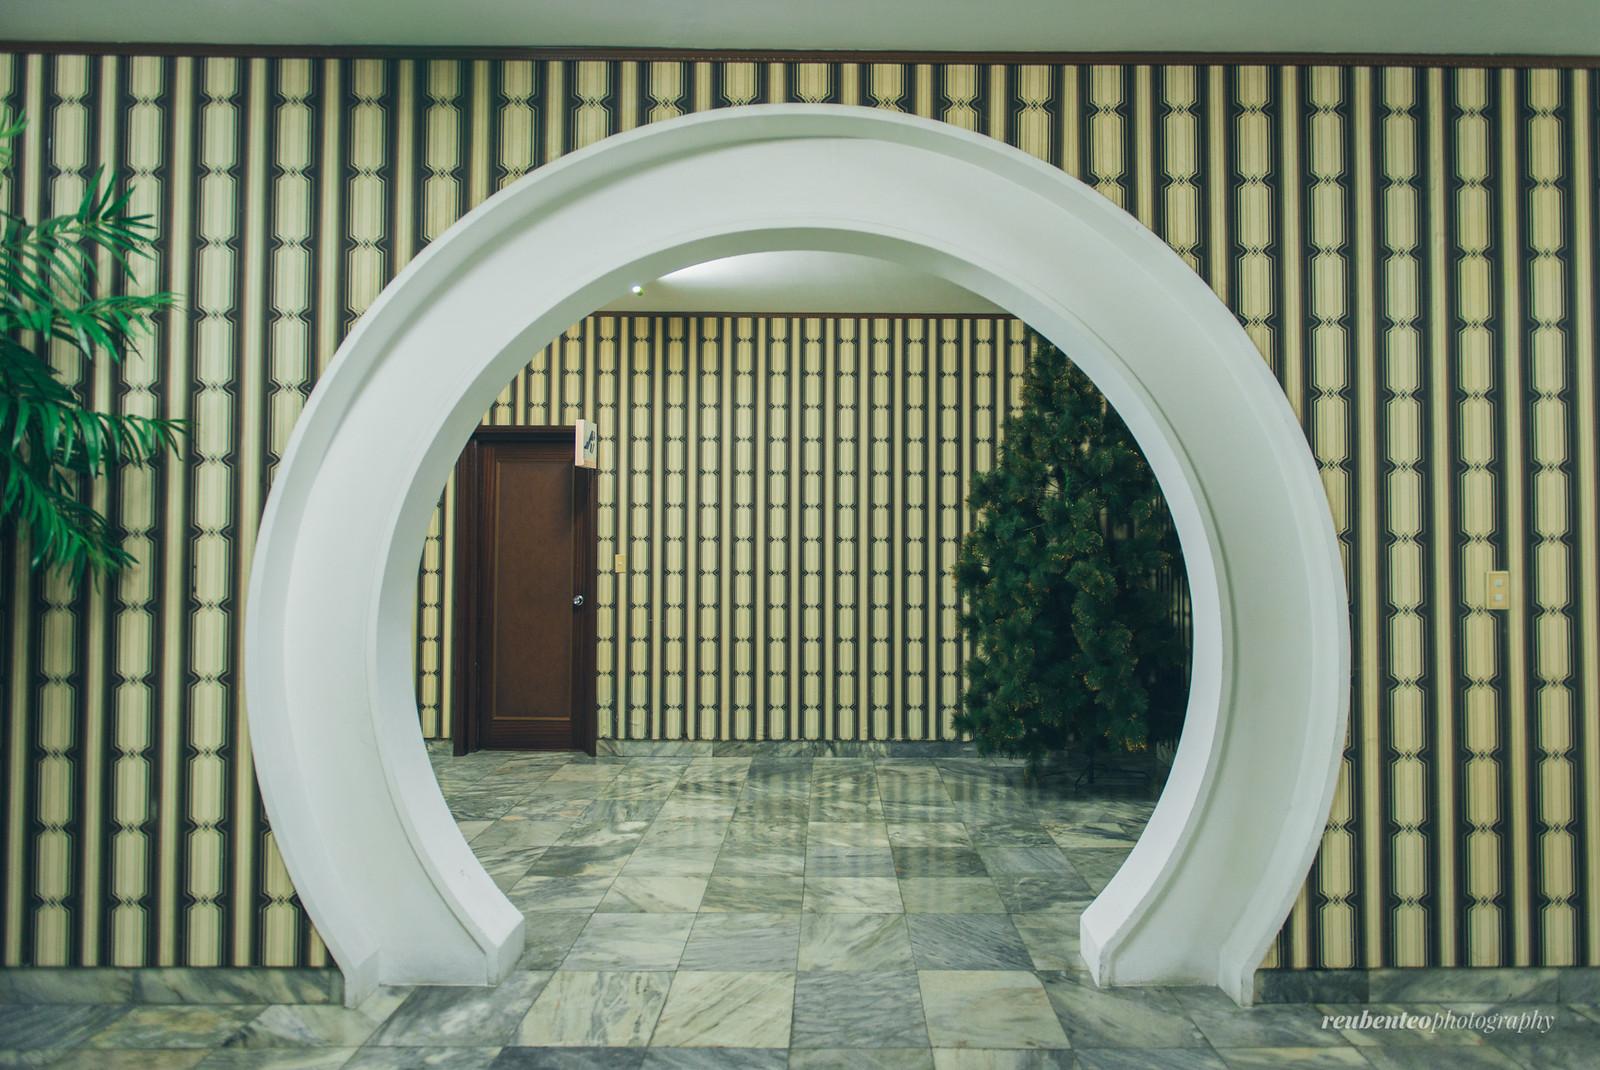 Round doorway